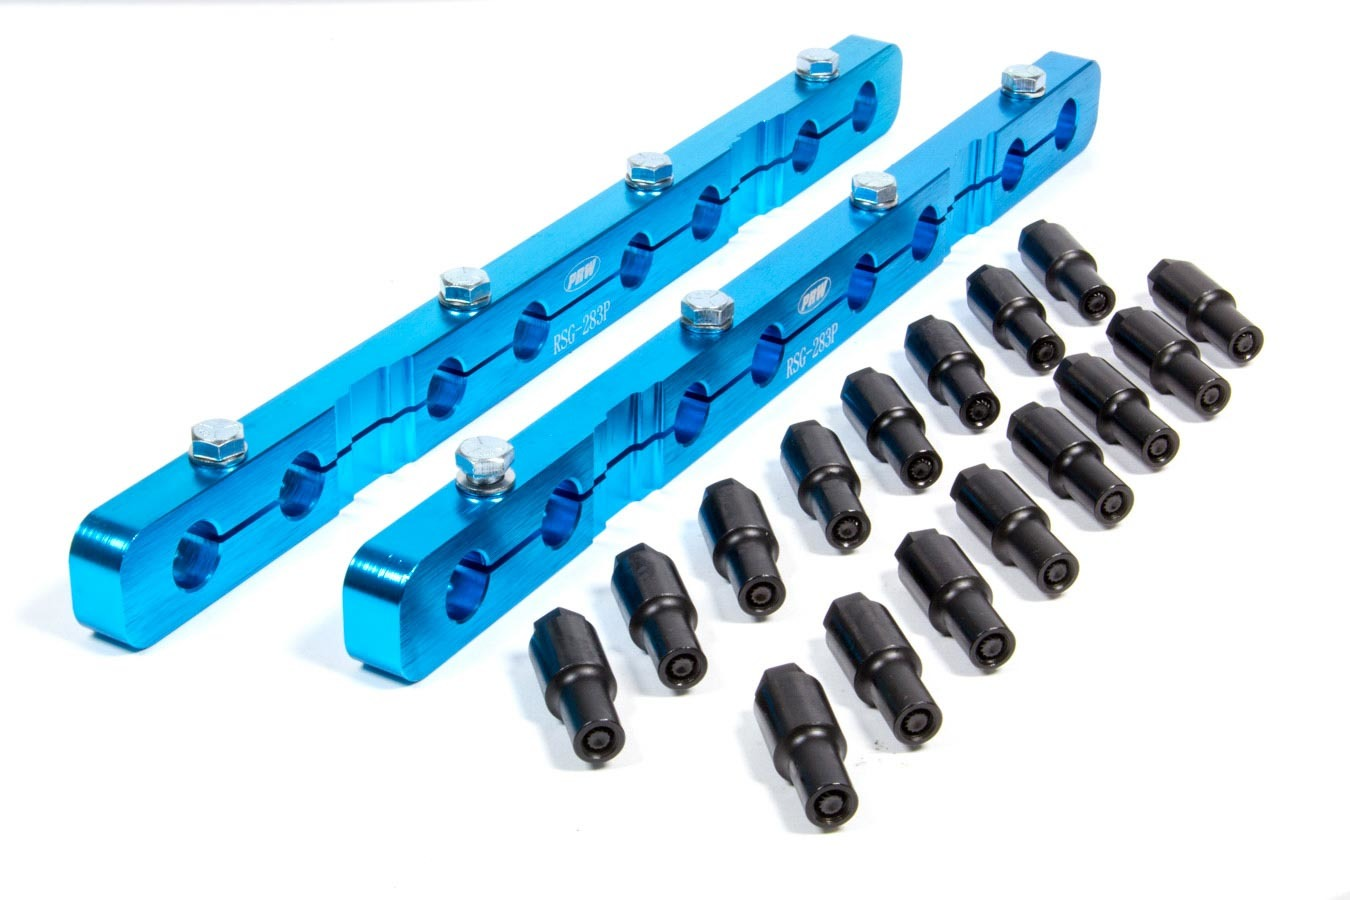 PRW Industries 1535002 Rocker Arm Stud Girdle, Solid Bar, 3/8-24 in Thread Studs, Aluminum, Blue Anodized, Small Block Chevy, Kit